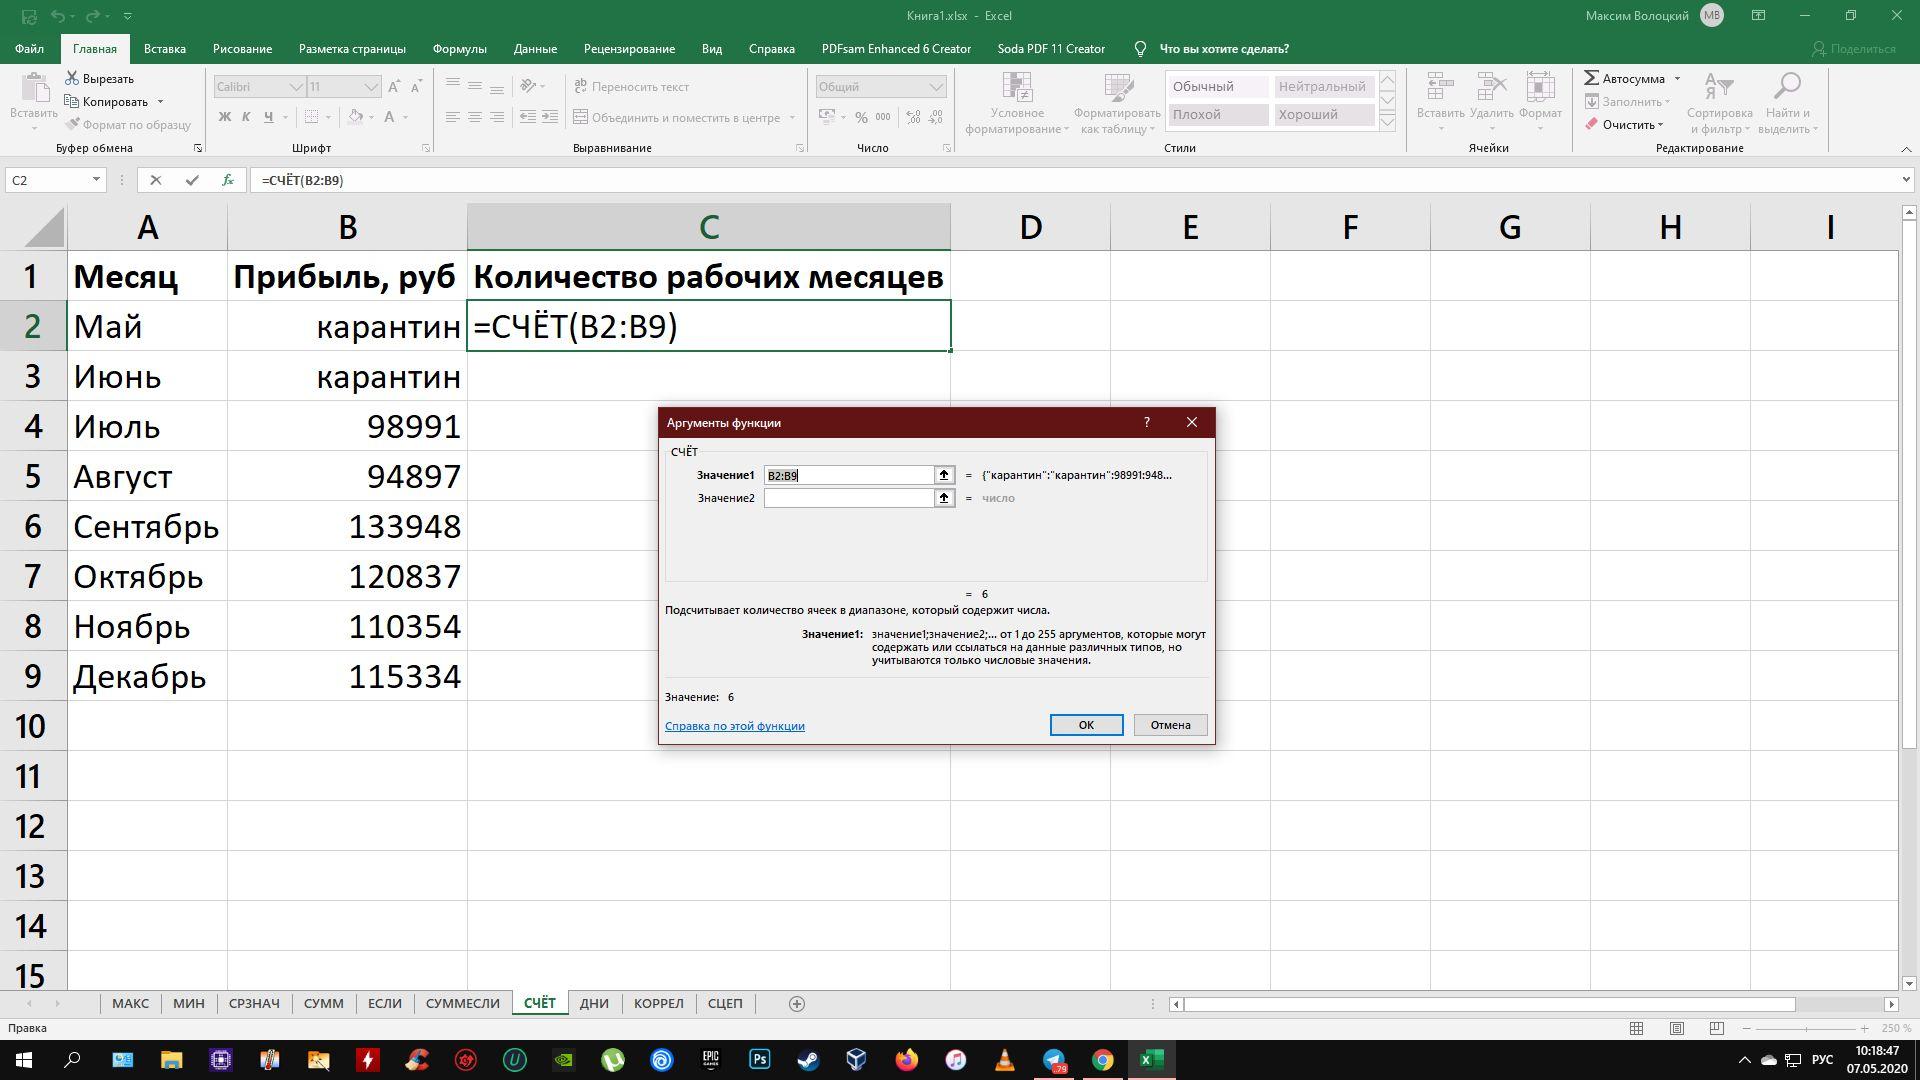 10 formul v excel yak polegshat vam zhittya 7 - 10 формул в Excel, які полегшать вам життя